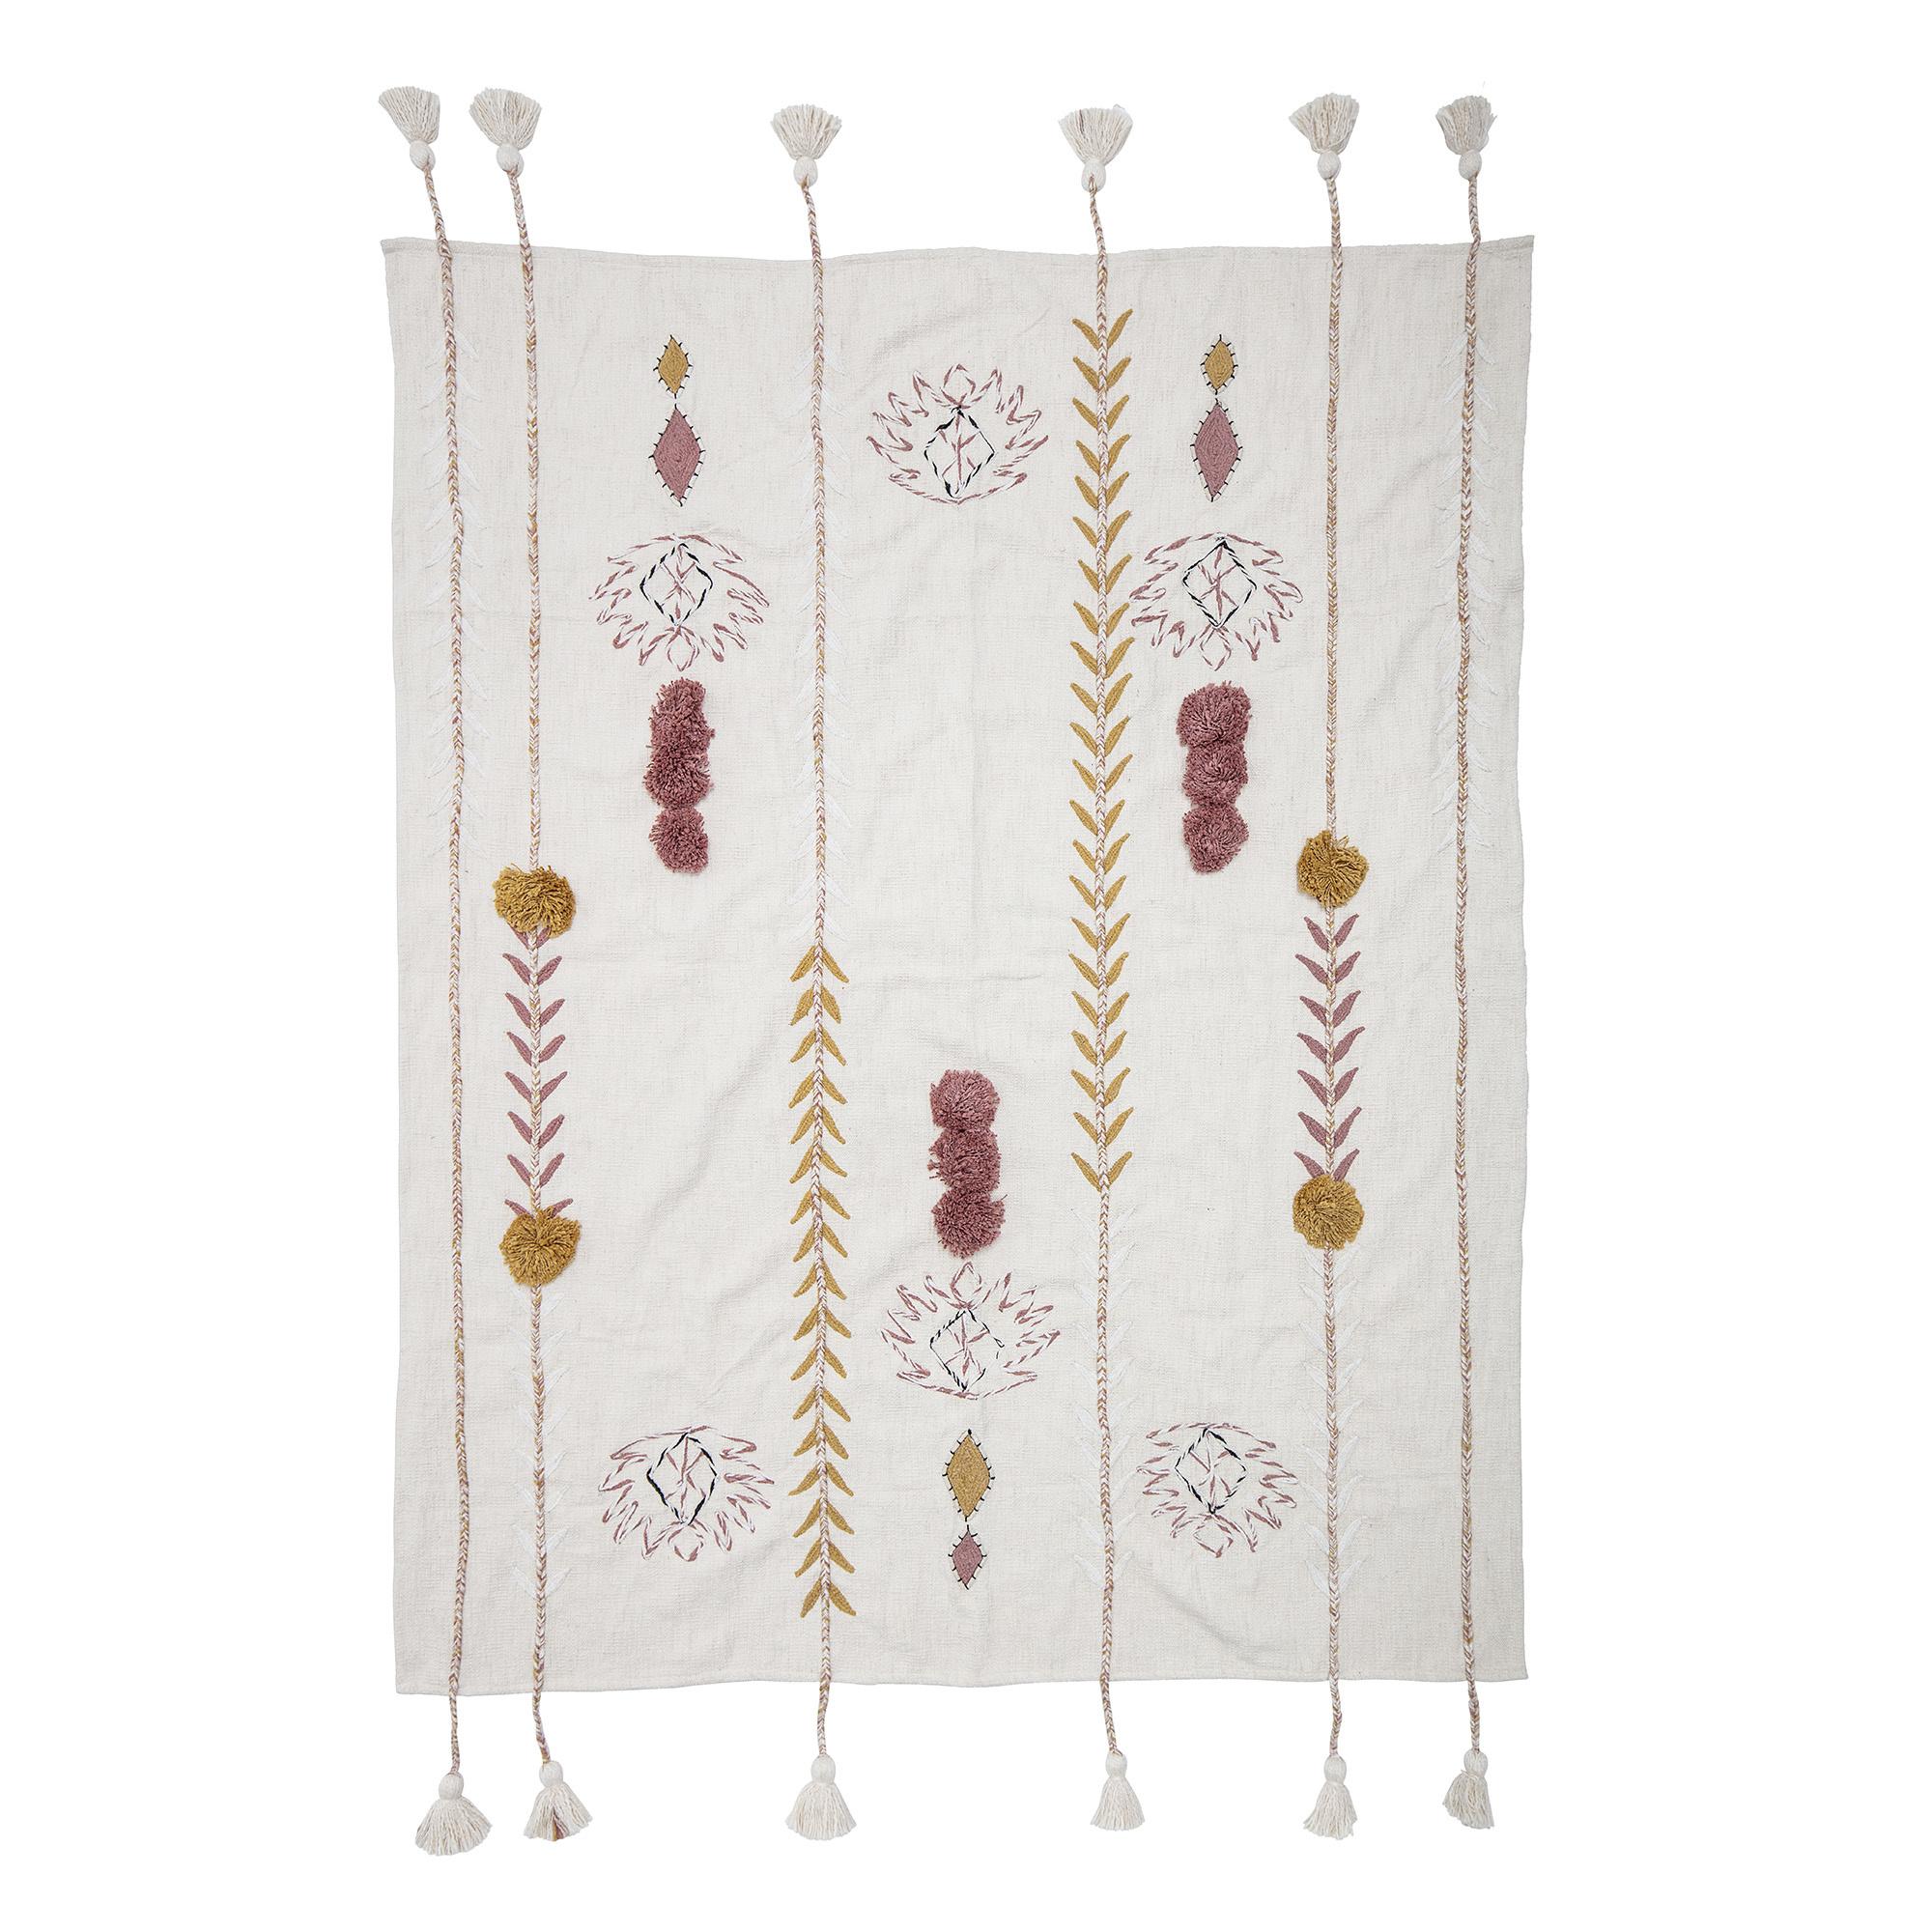 Bloomingville Blanket / Plaid 100% cotton - multi-color / pink - L150xW125cm - Bloomingville